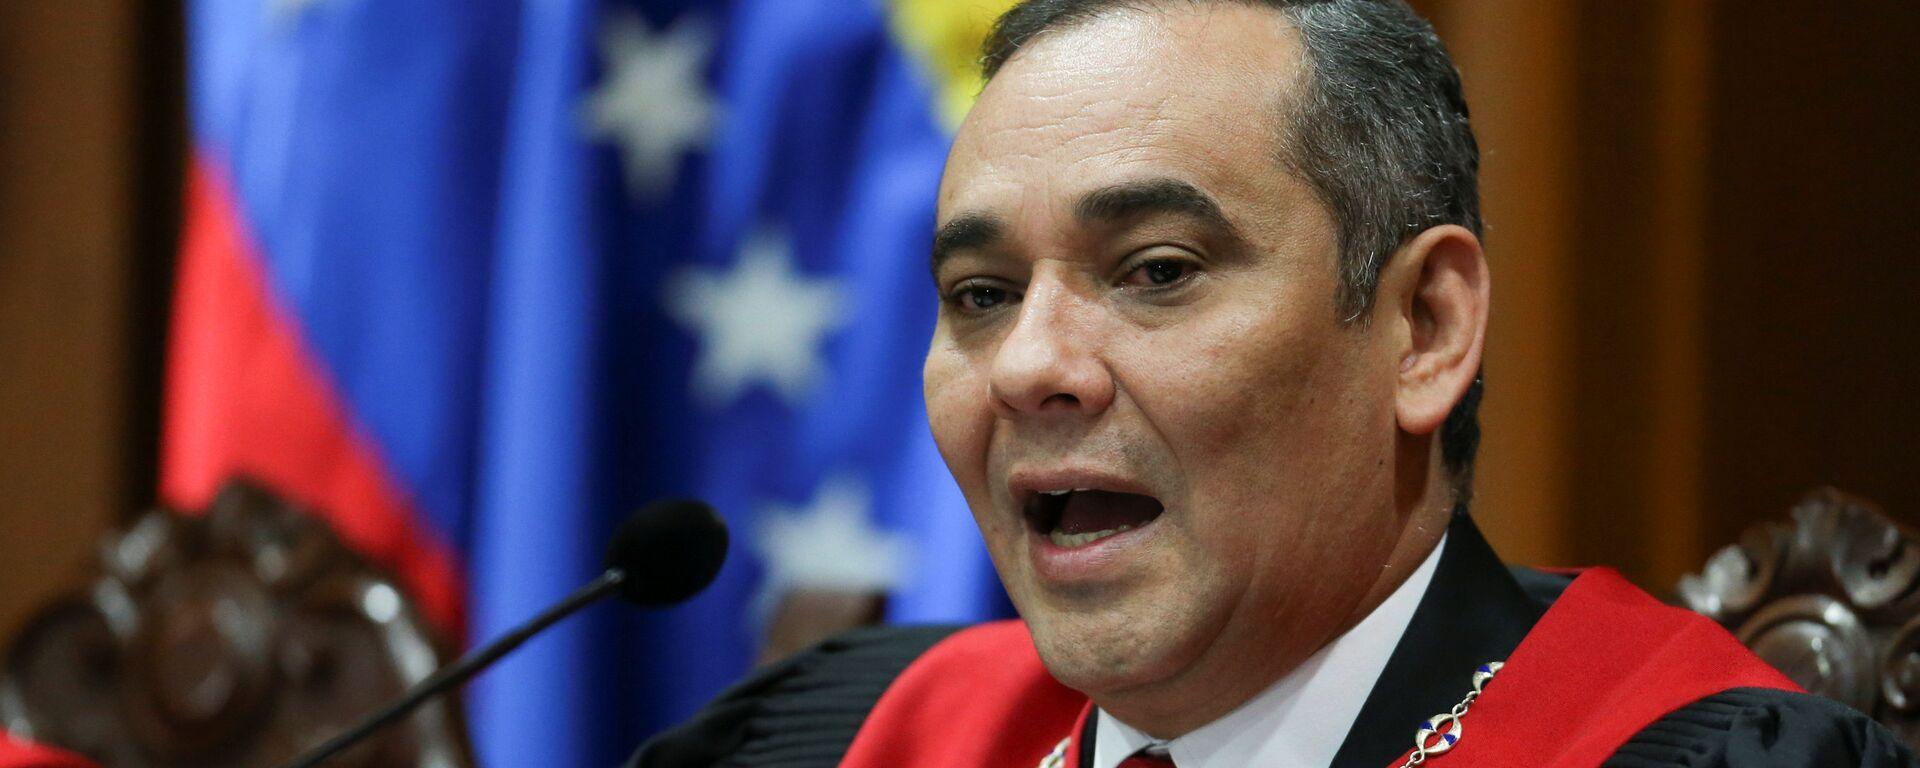 Maikel Moreno, presidente del Tribunal Supremo de Venezuela - Sputnik Mundo, 1920, 27.07.2021